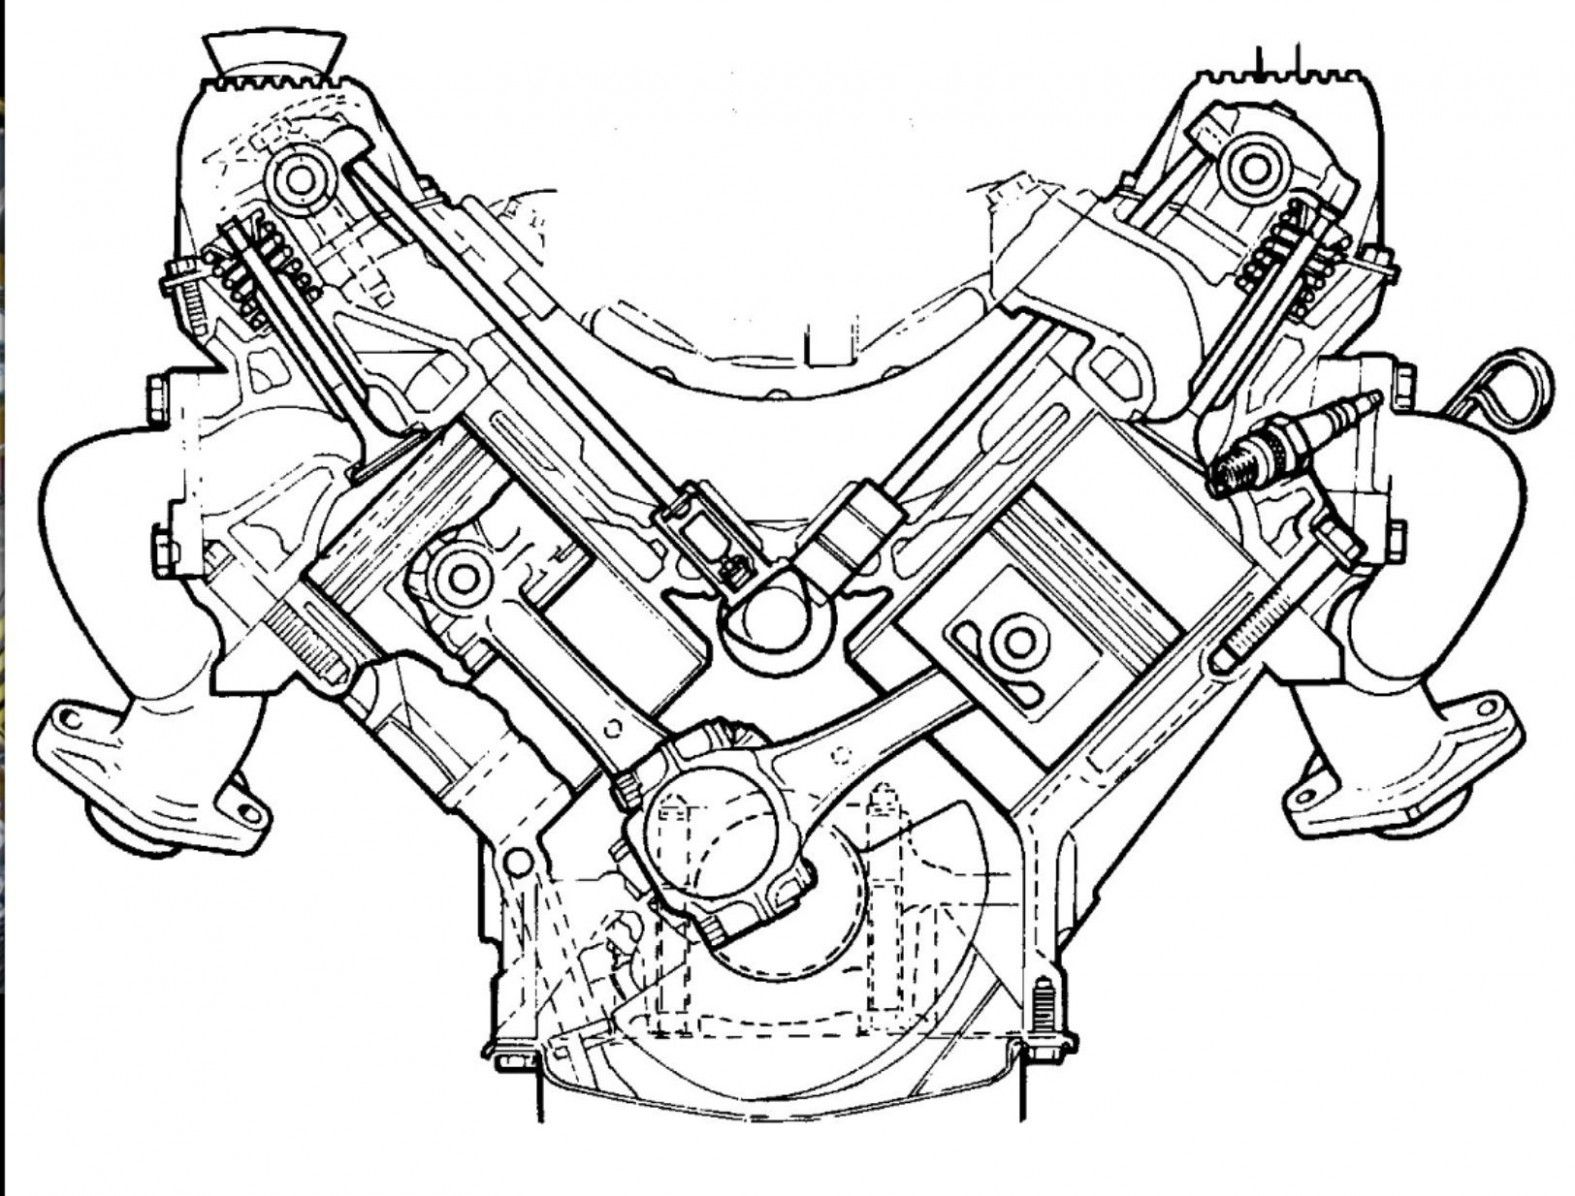 Rover V8 Engine Diagram Rover V8 Engine Diagram